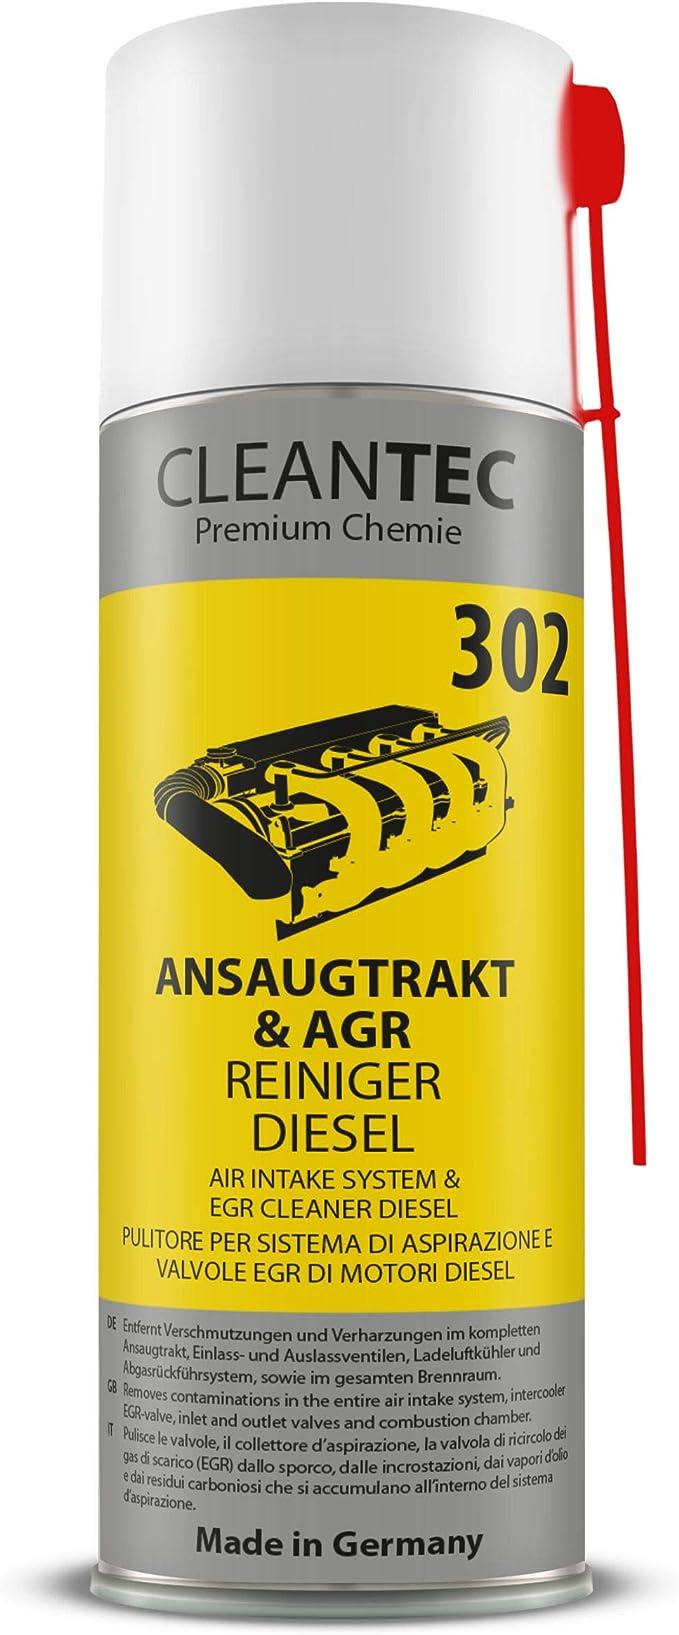 Cleantec 302 Diesel Ansaugtrakt Ansaug System Agr Egr Turbo Reiniger Spray 400ml Auto